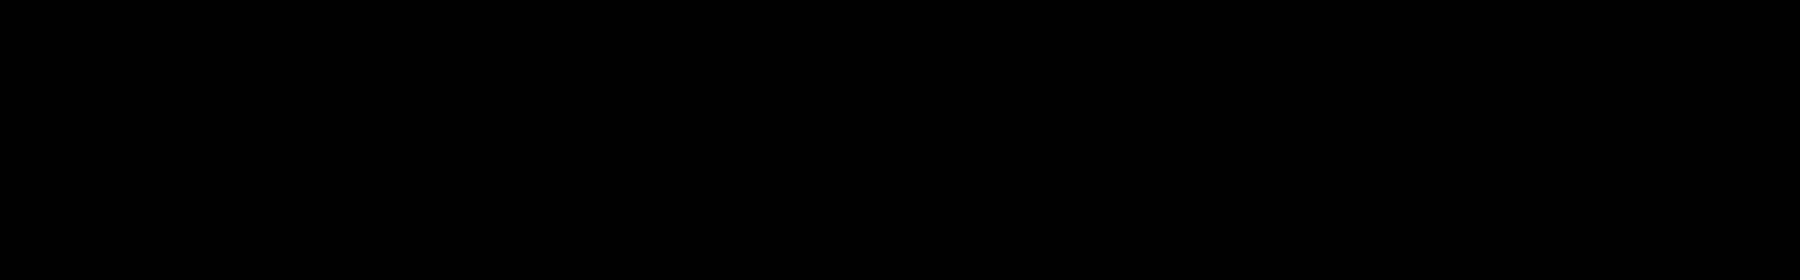 CHAOS audio waveform